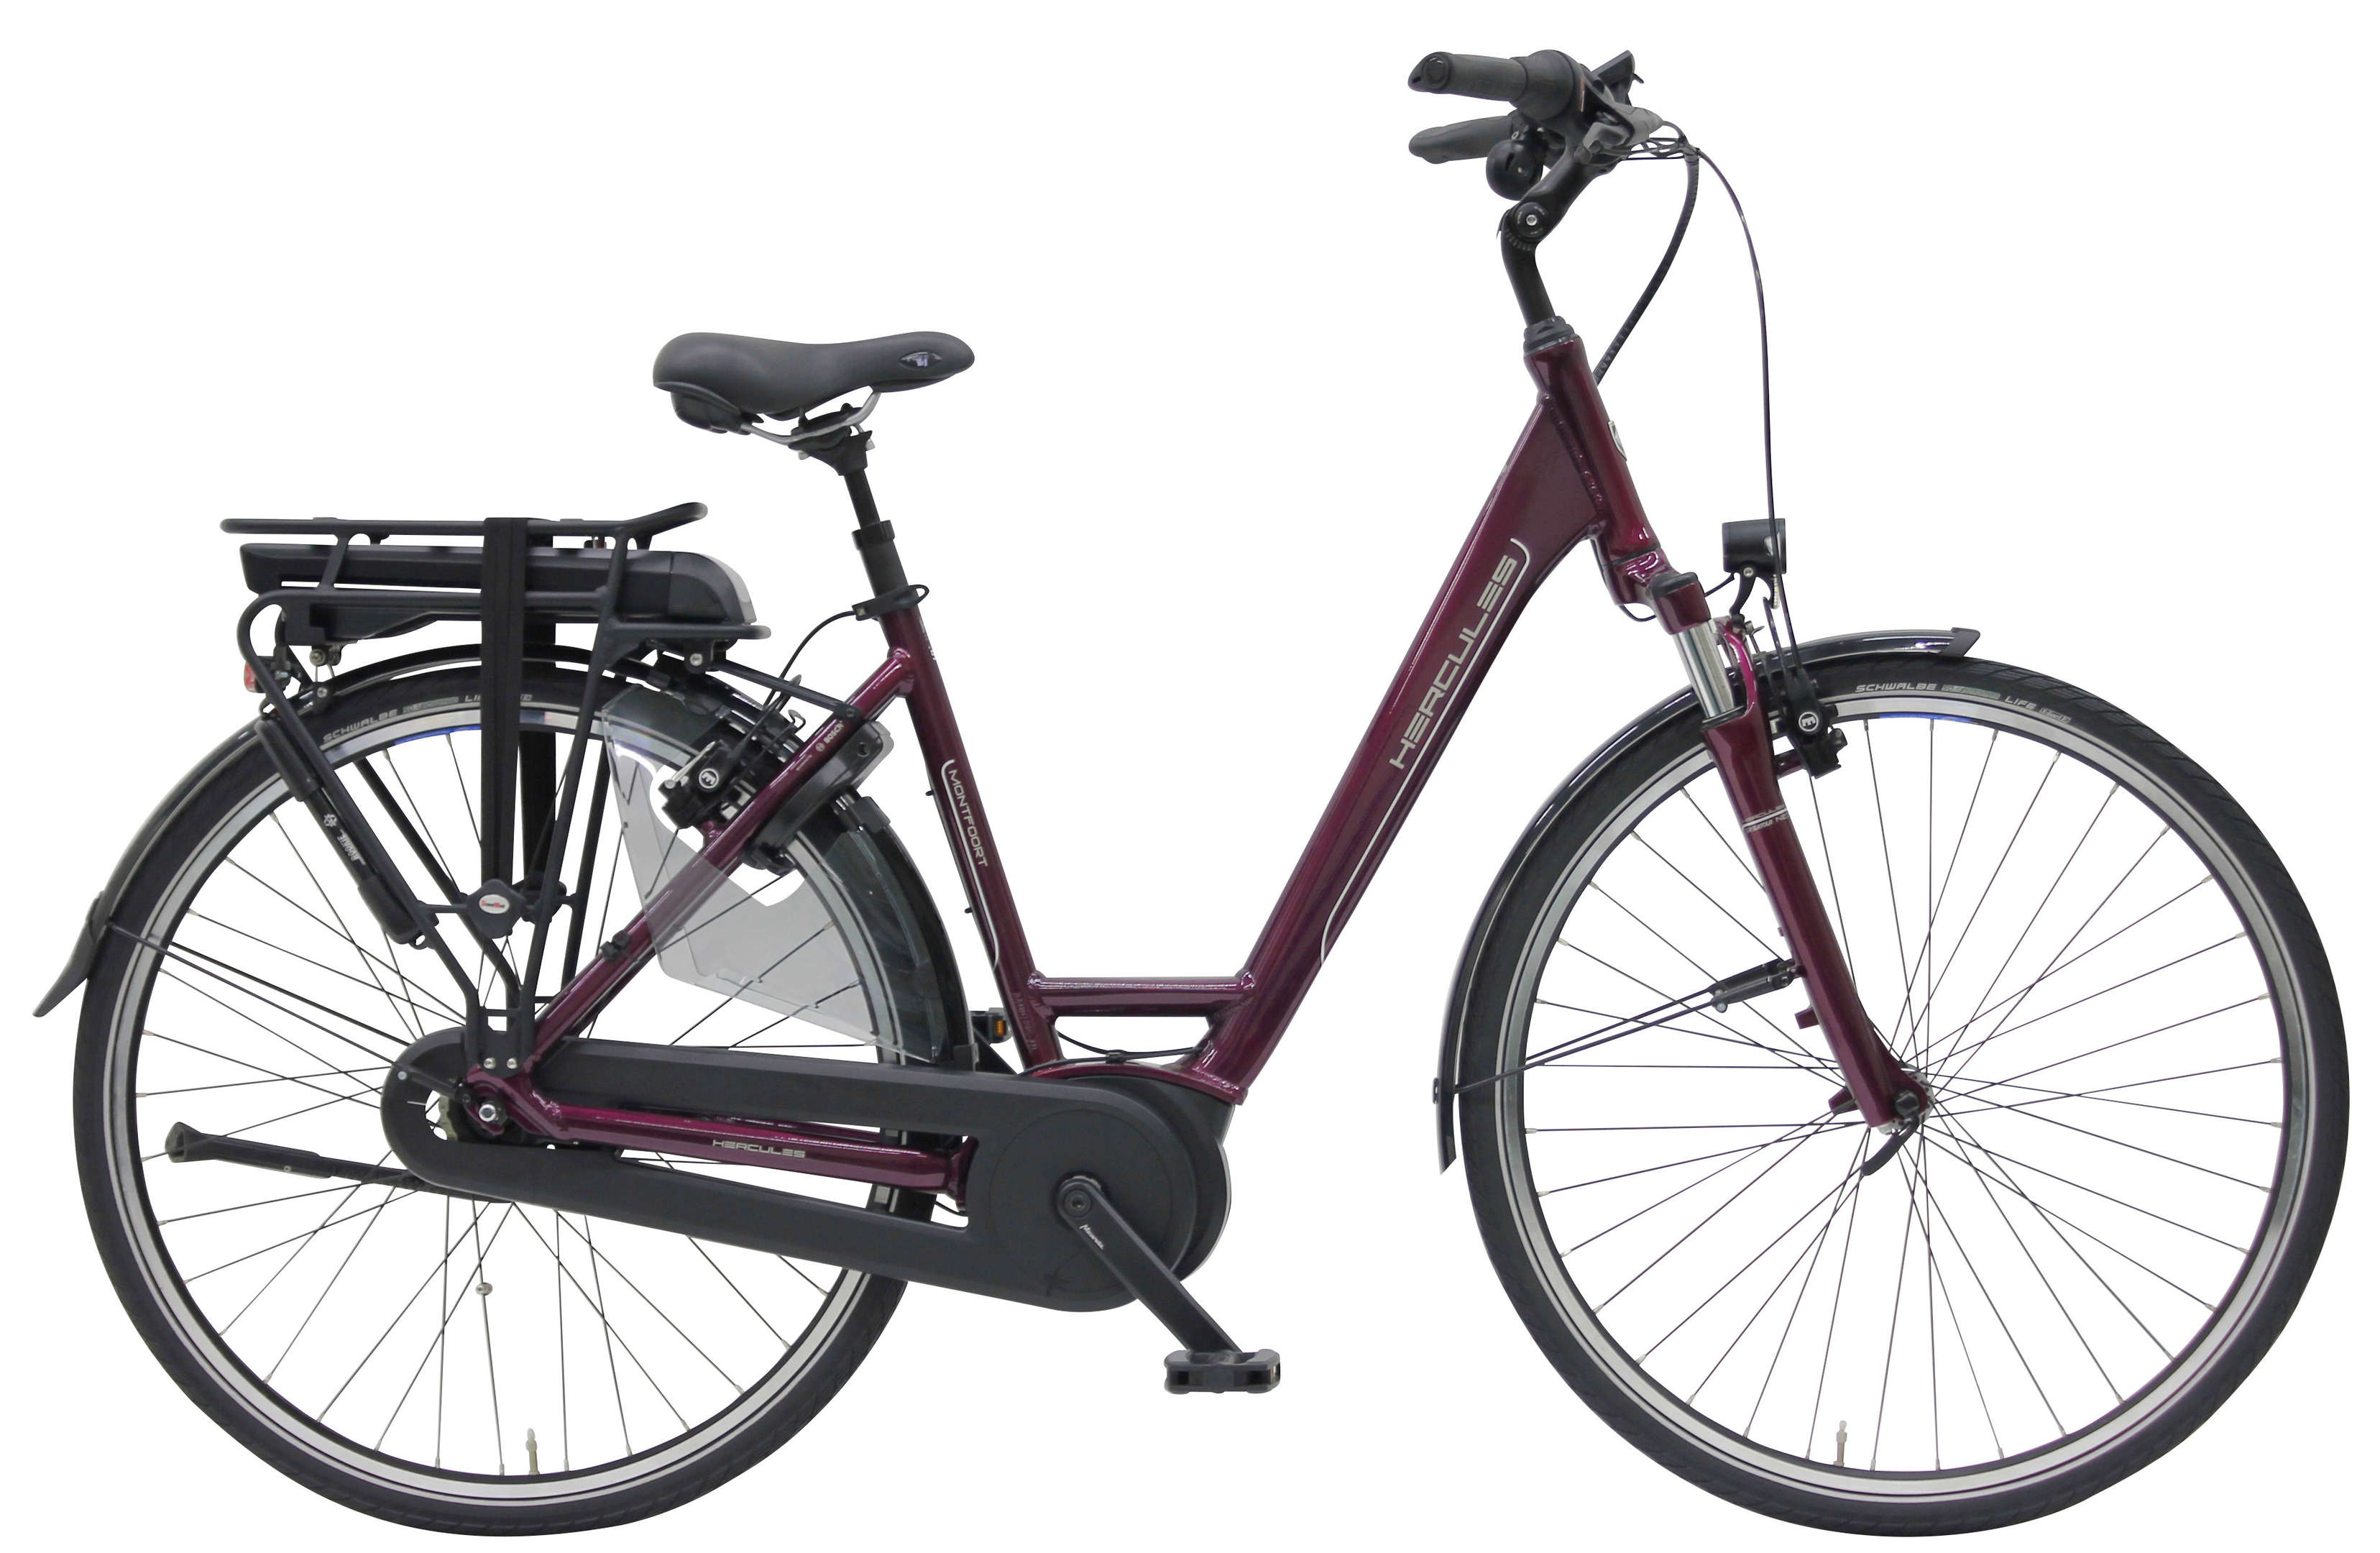 hercules e bike montfoort f7 eurorad bikeleasingeurorad. Black Bedroom Furniture Sets. Home Design Ideas